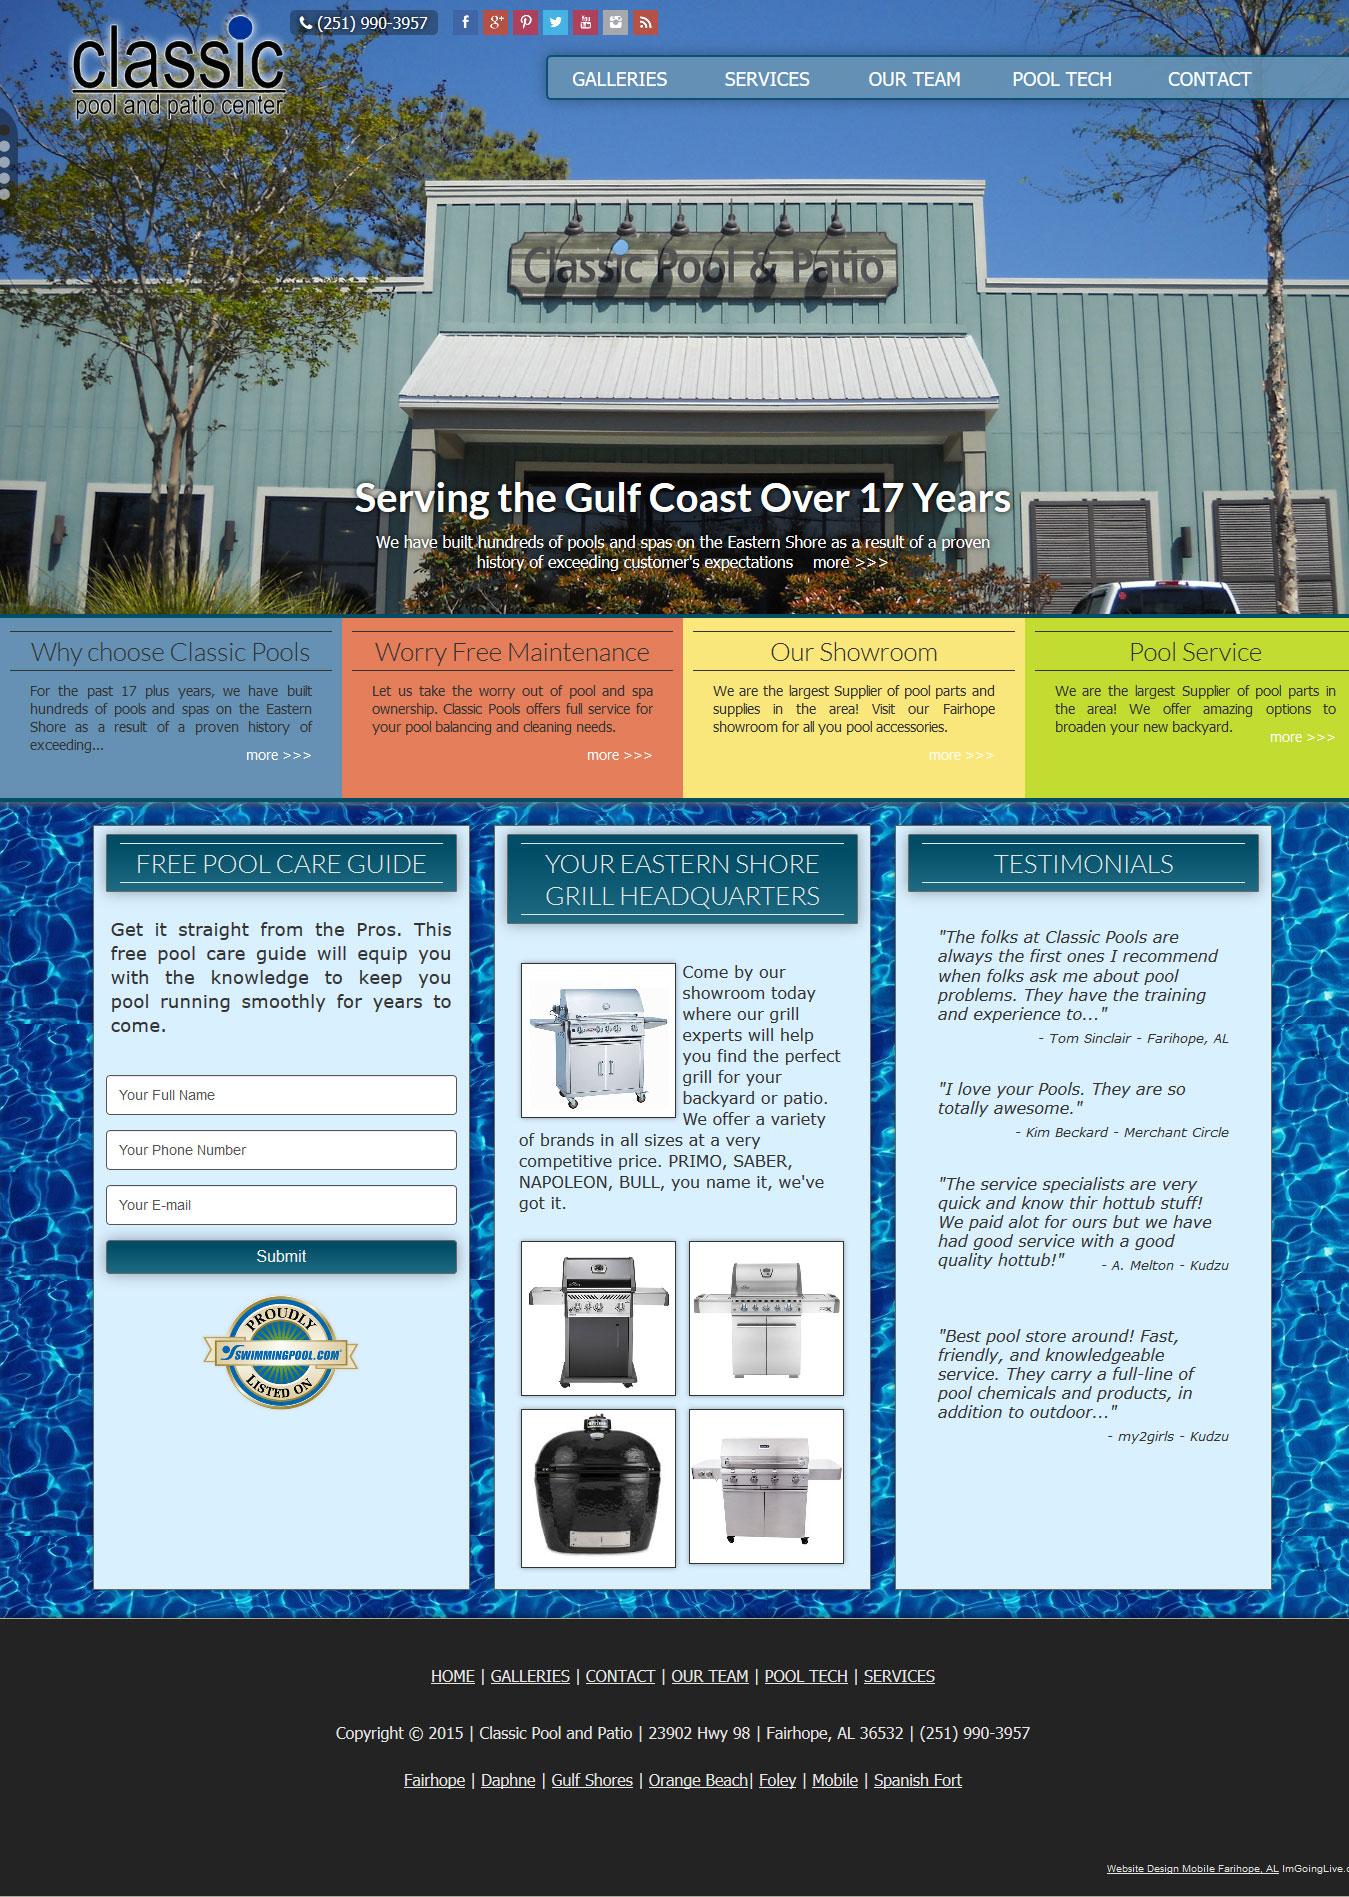 Swimming Pool web site Swimming Pool Company - Classic Pool